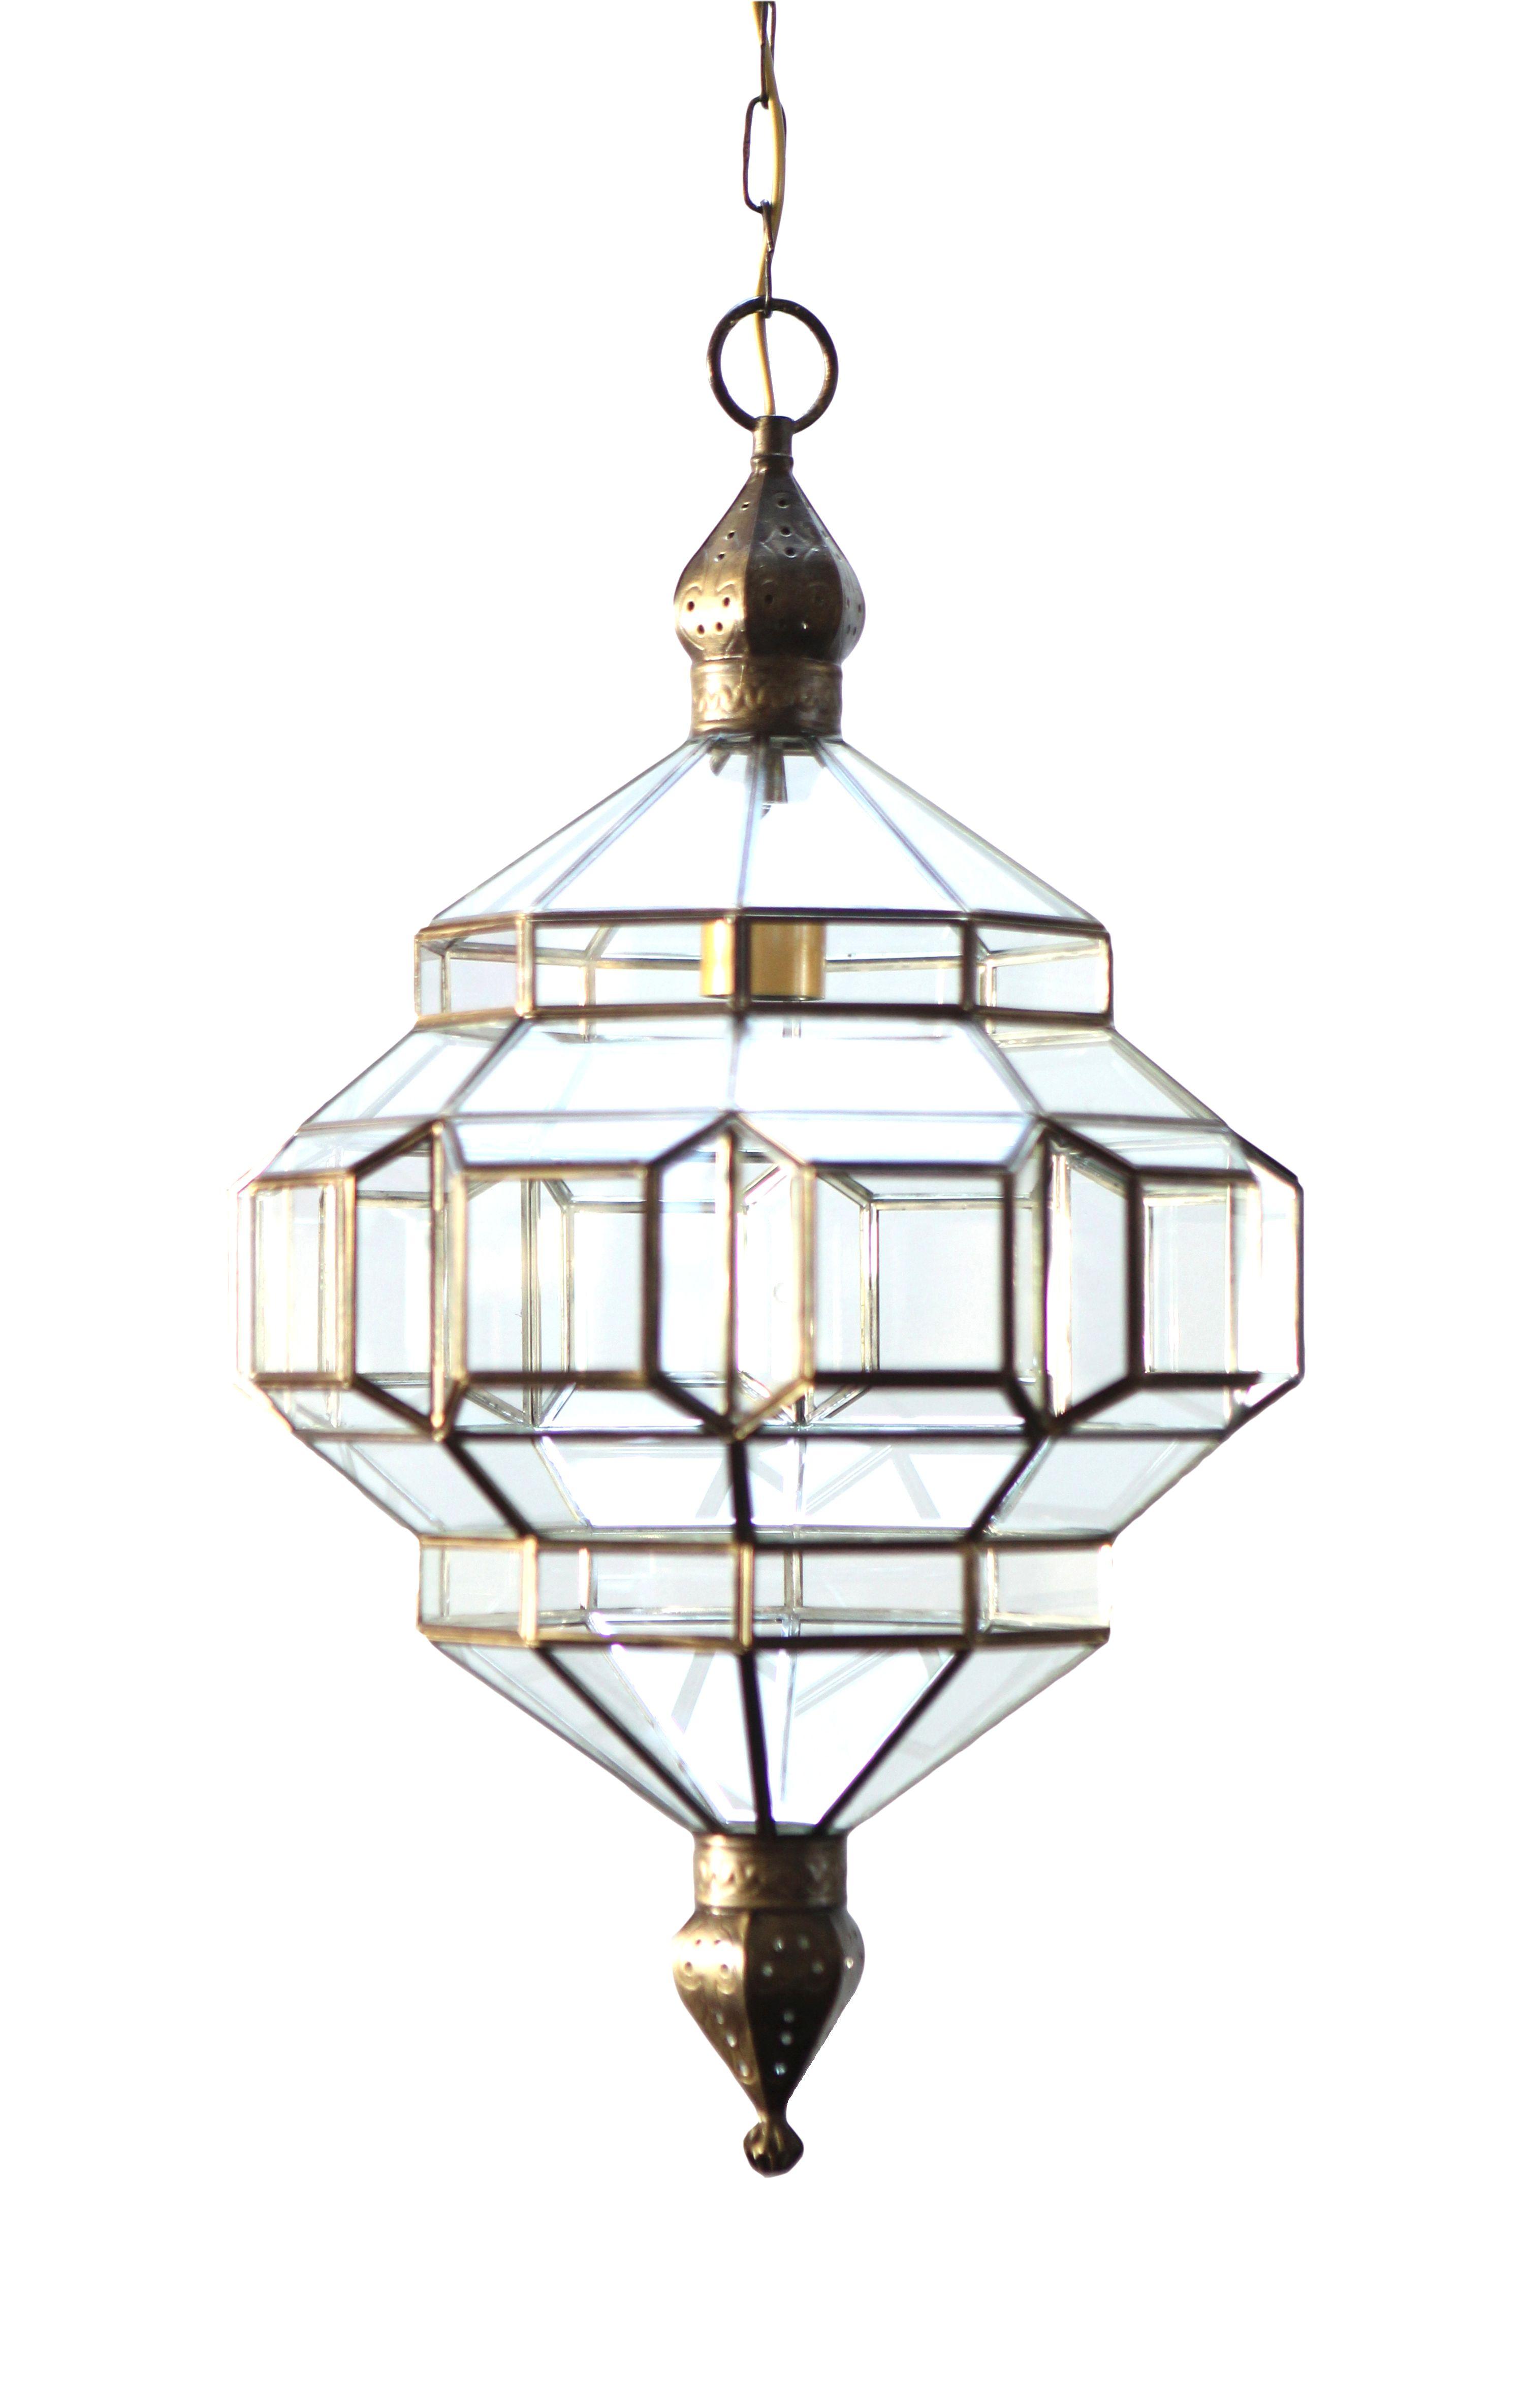 Alhambra granada lantern from laviva home providence homes granada cool lamps